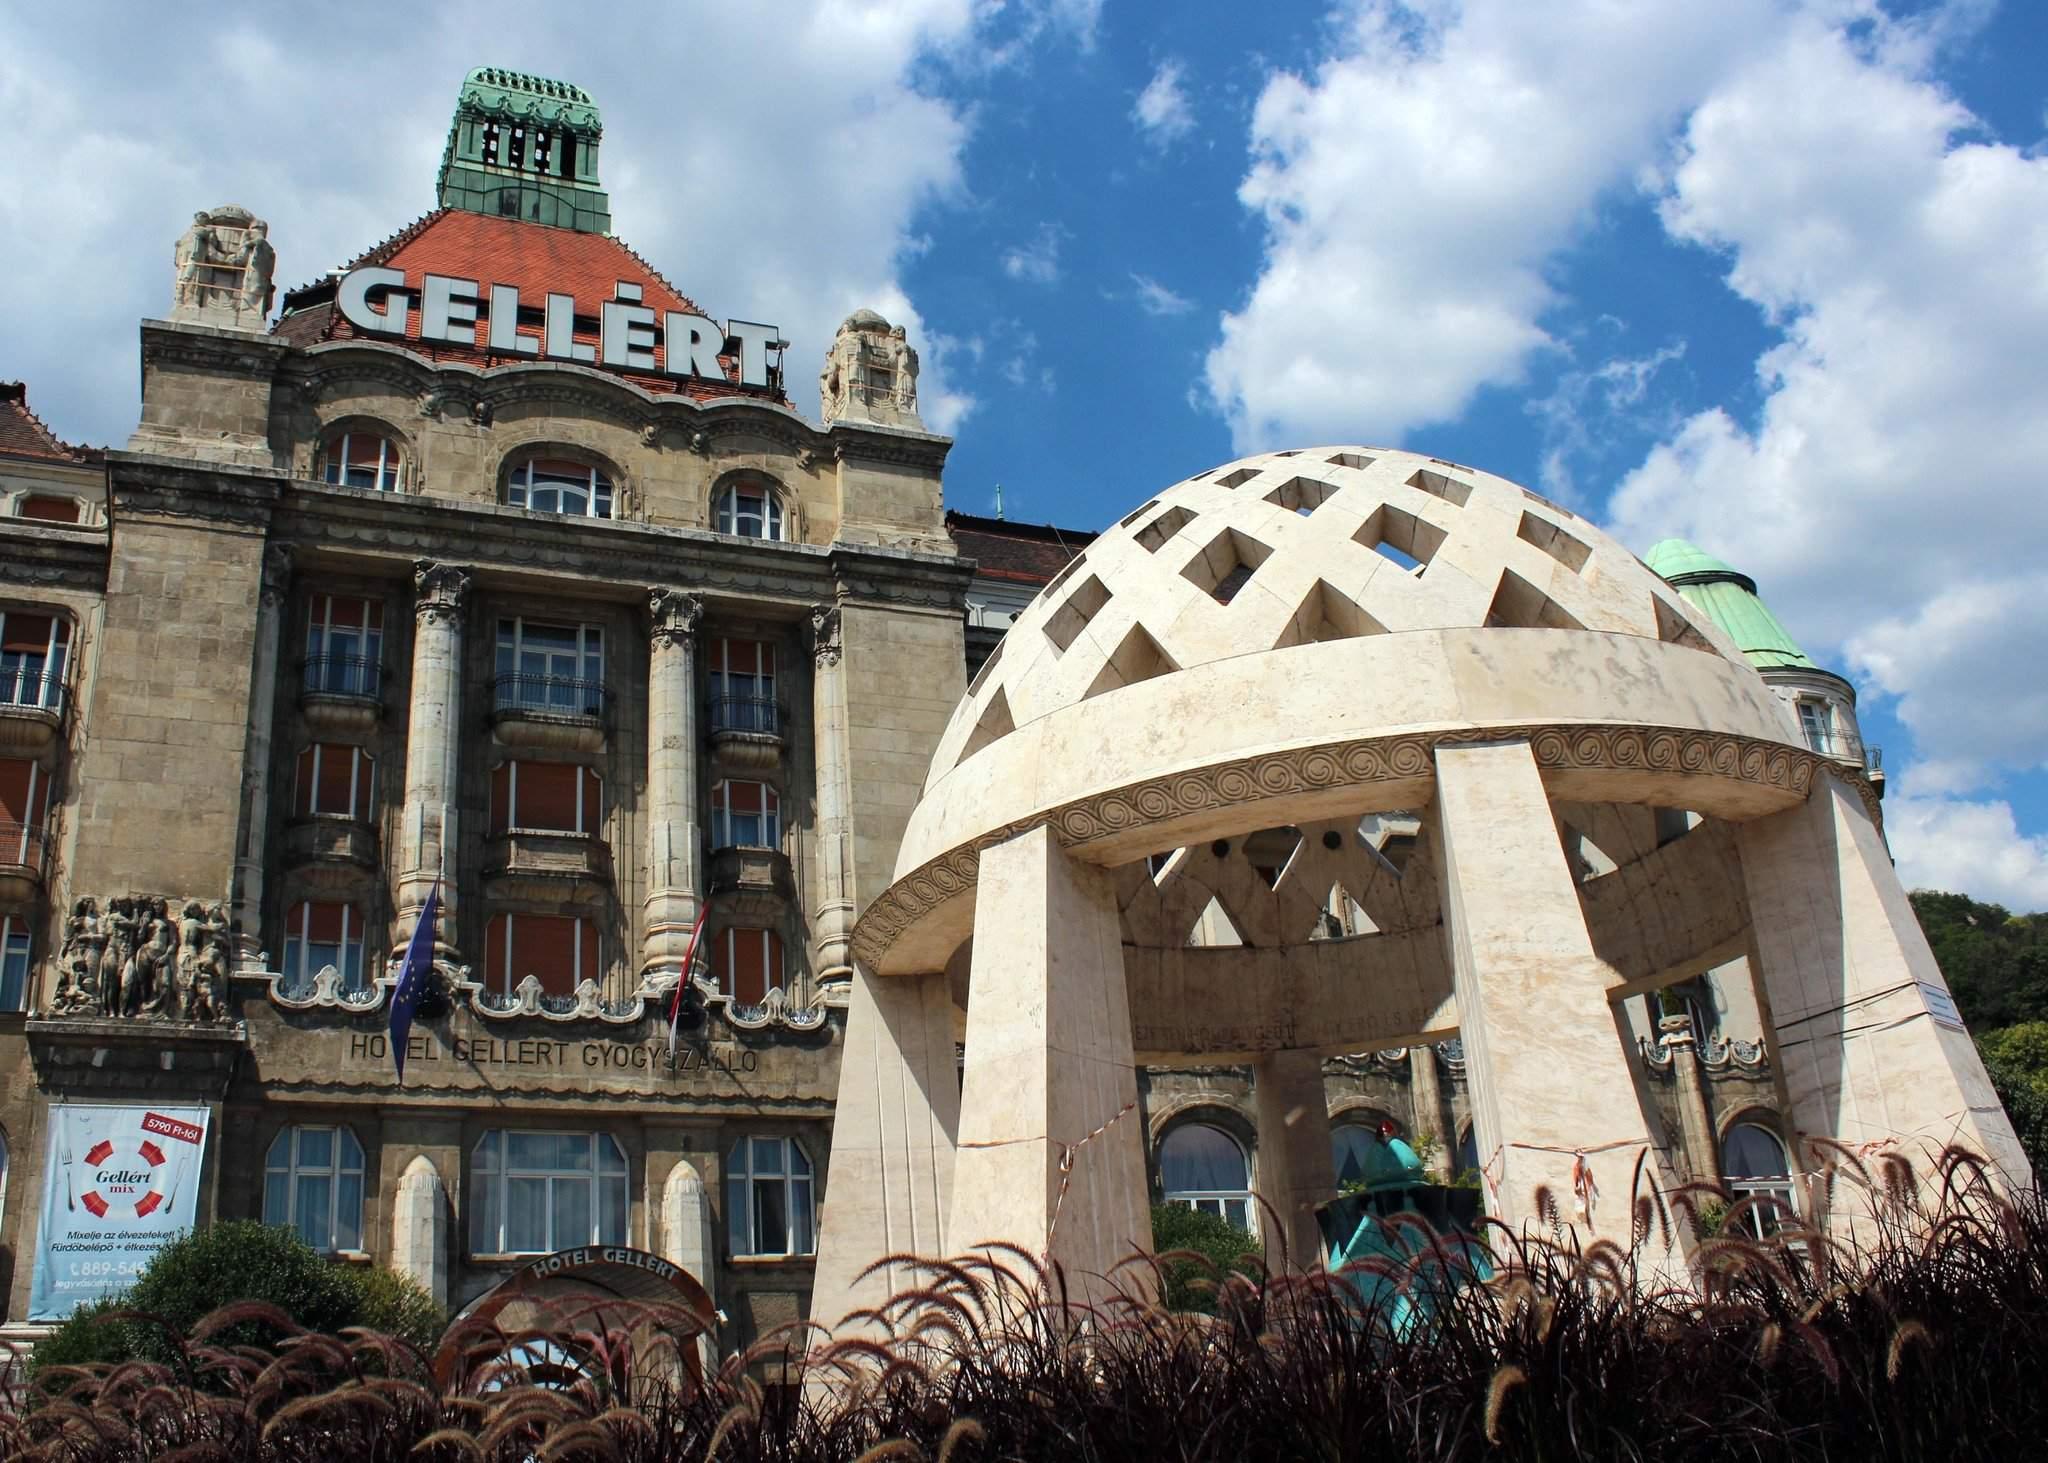 Gellért Hotel regains its former glory after renovation